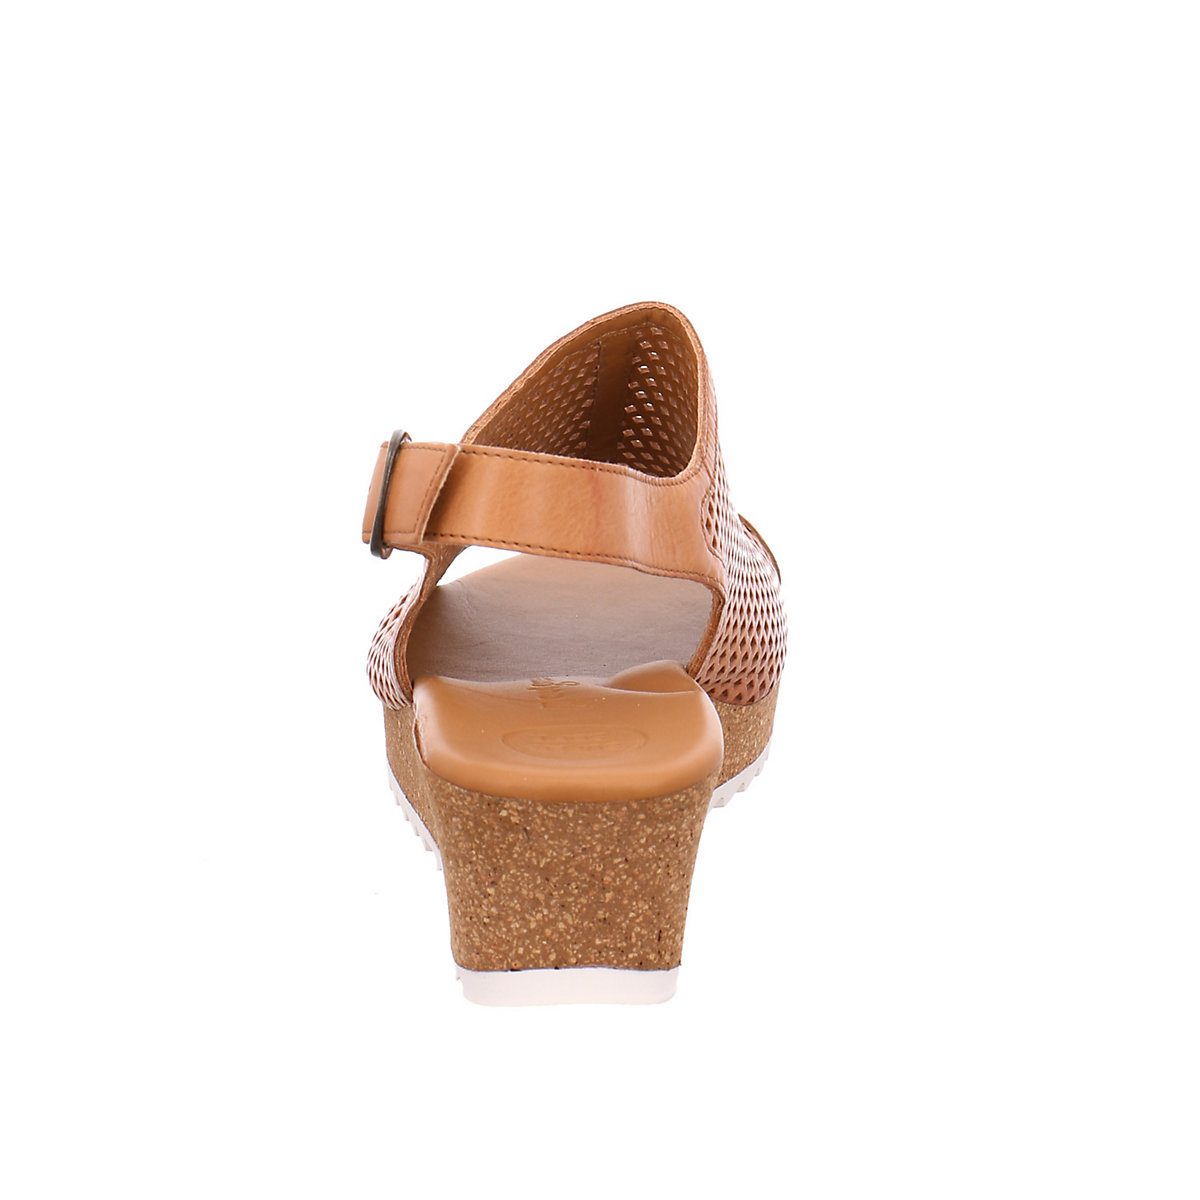 Paul Green Sandalen Klassische Sandalen braun